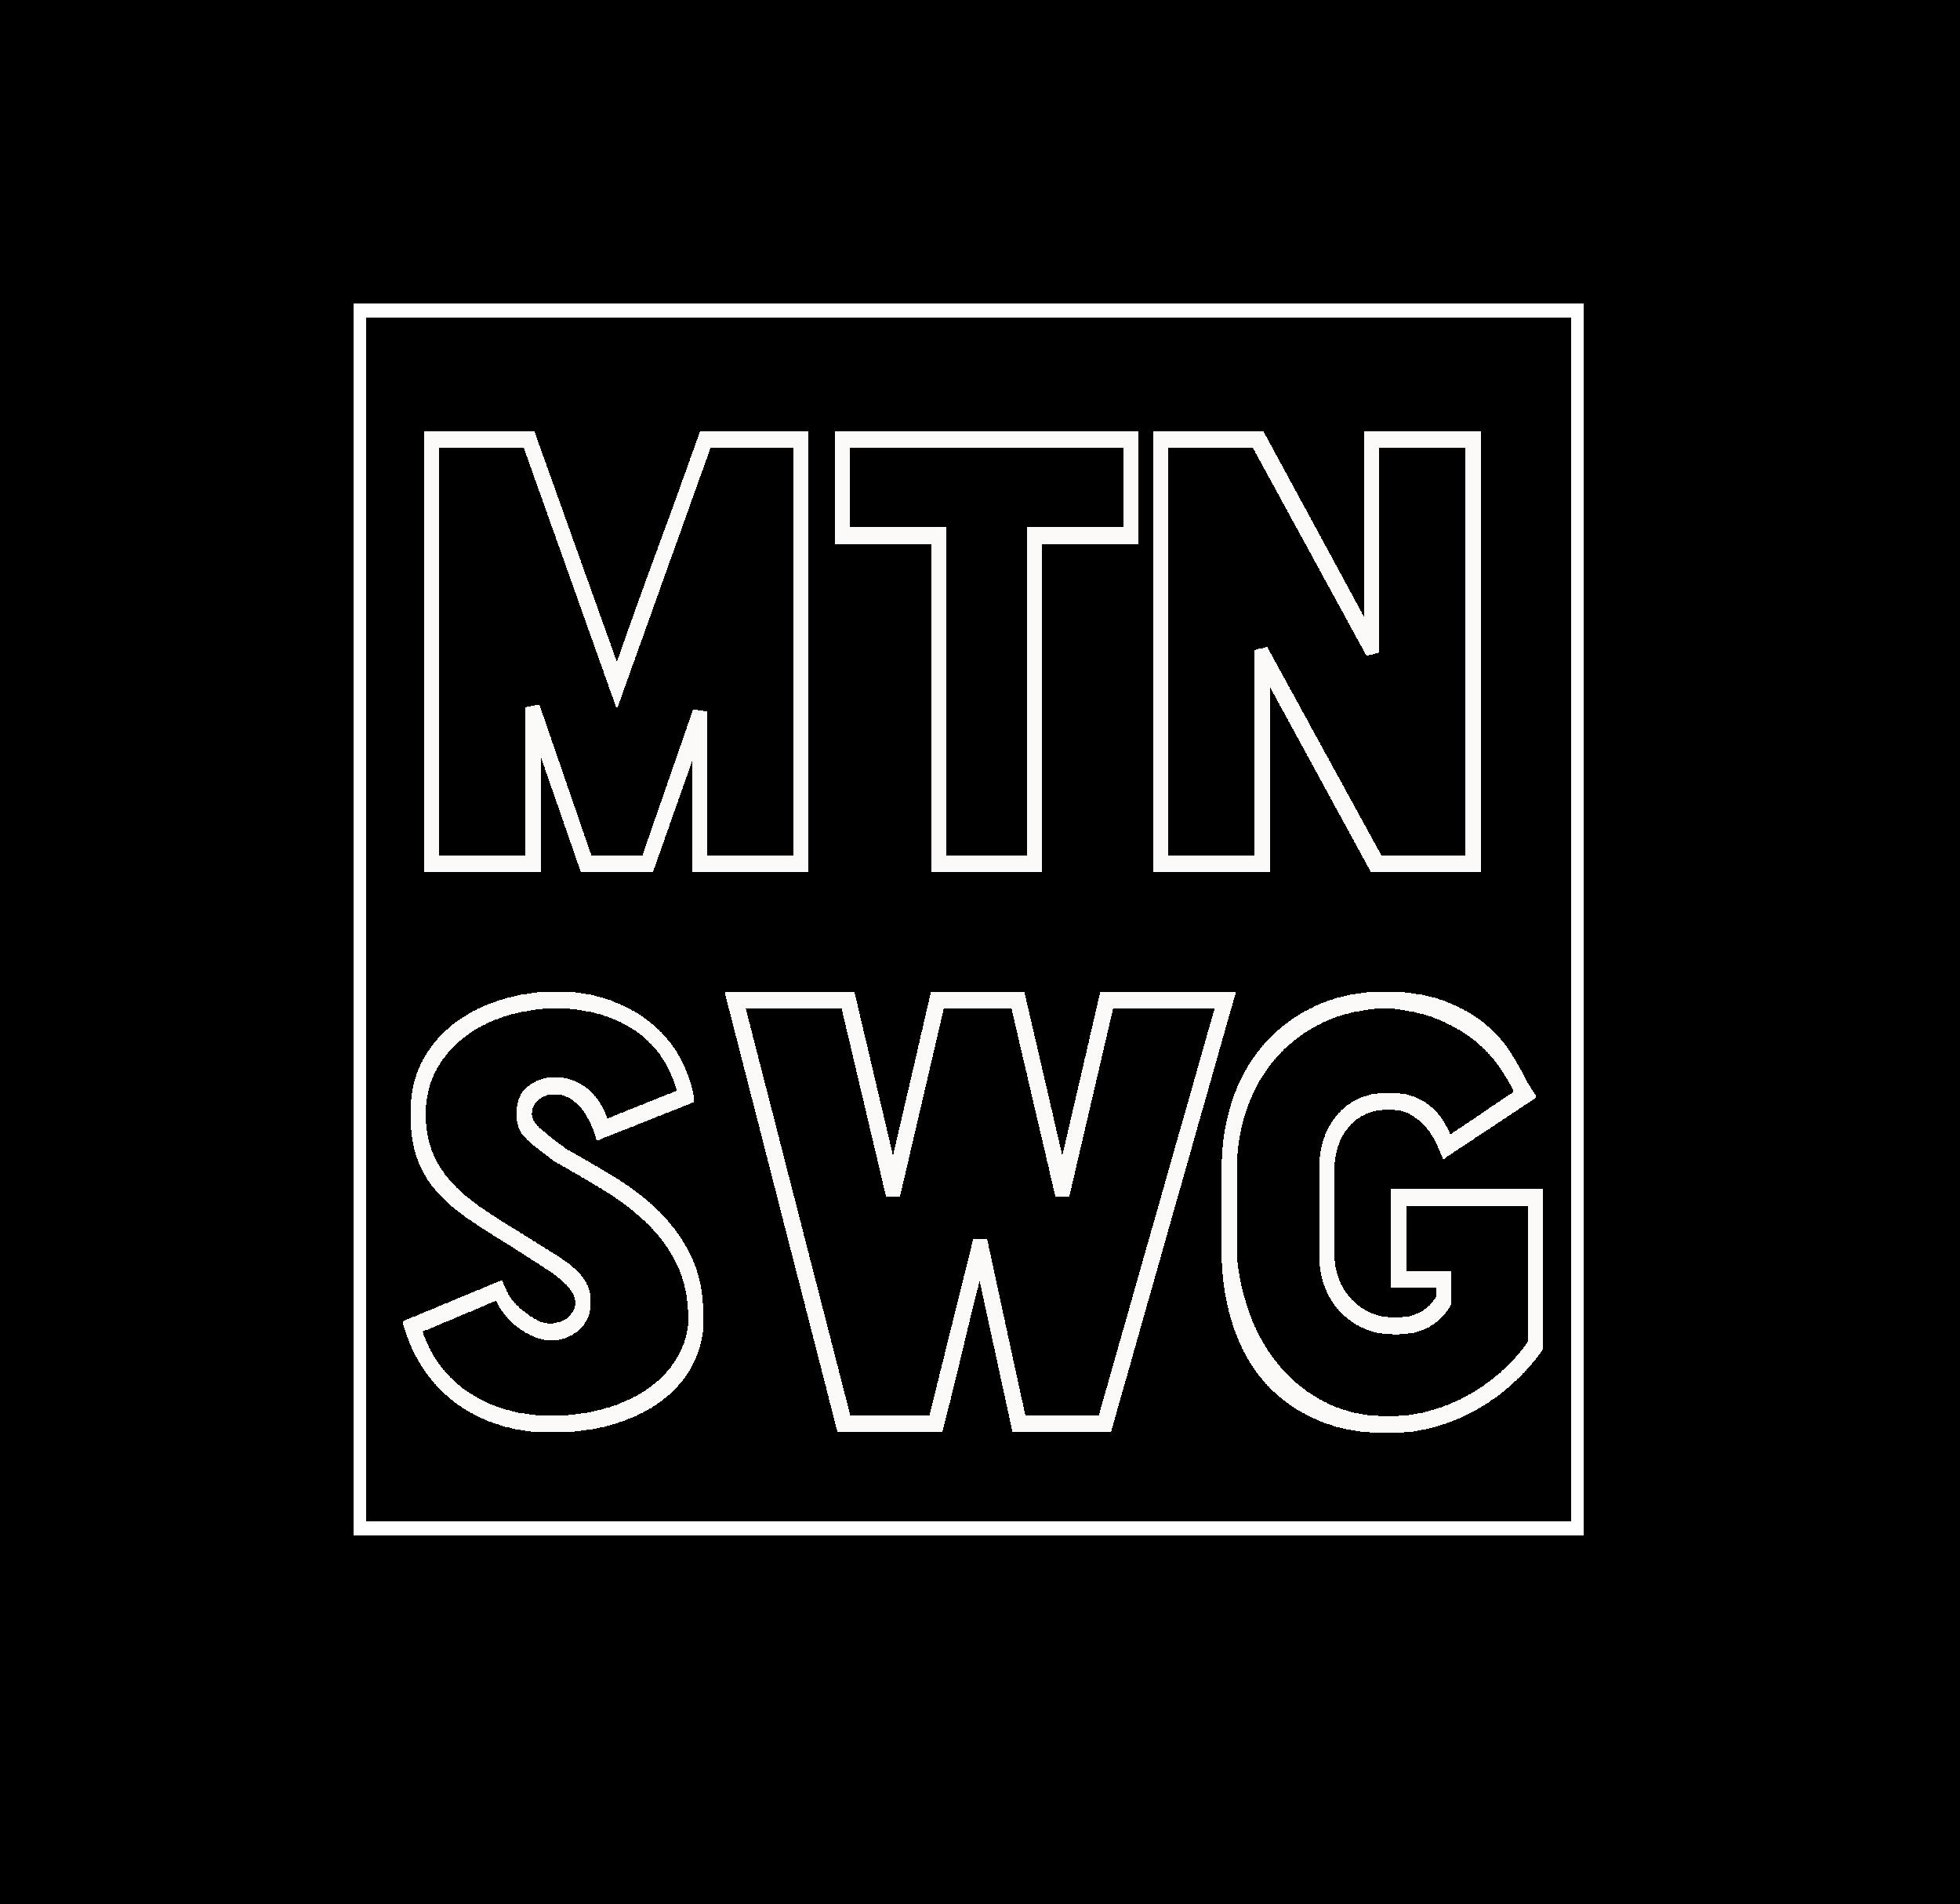 MTNSWG-LOGO (2).png